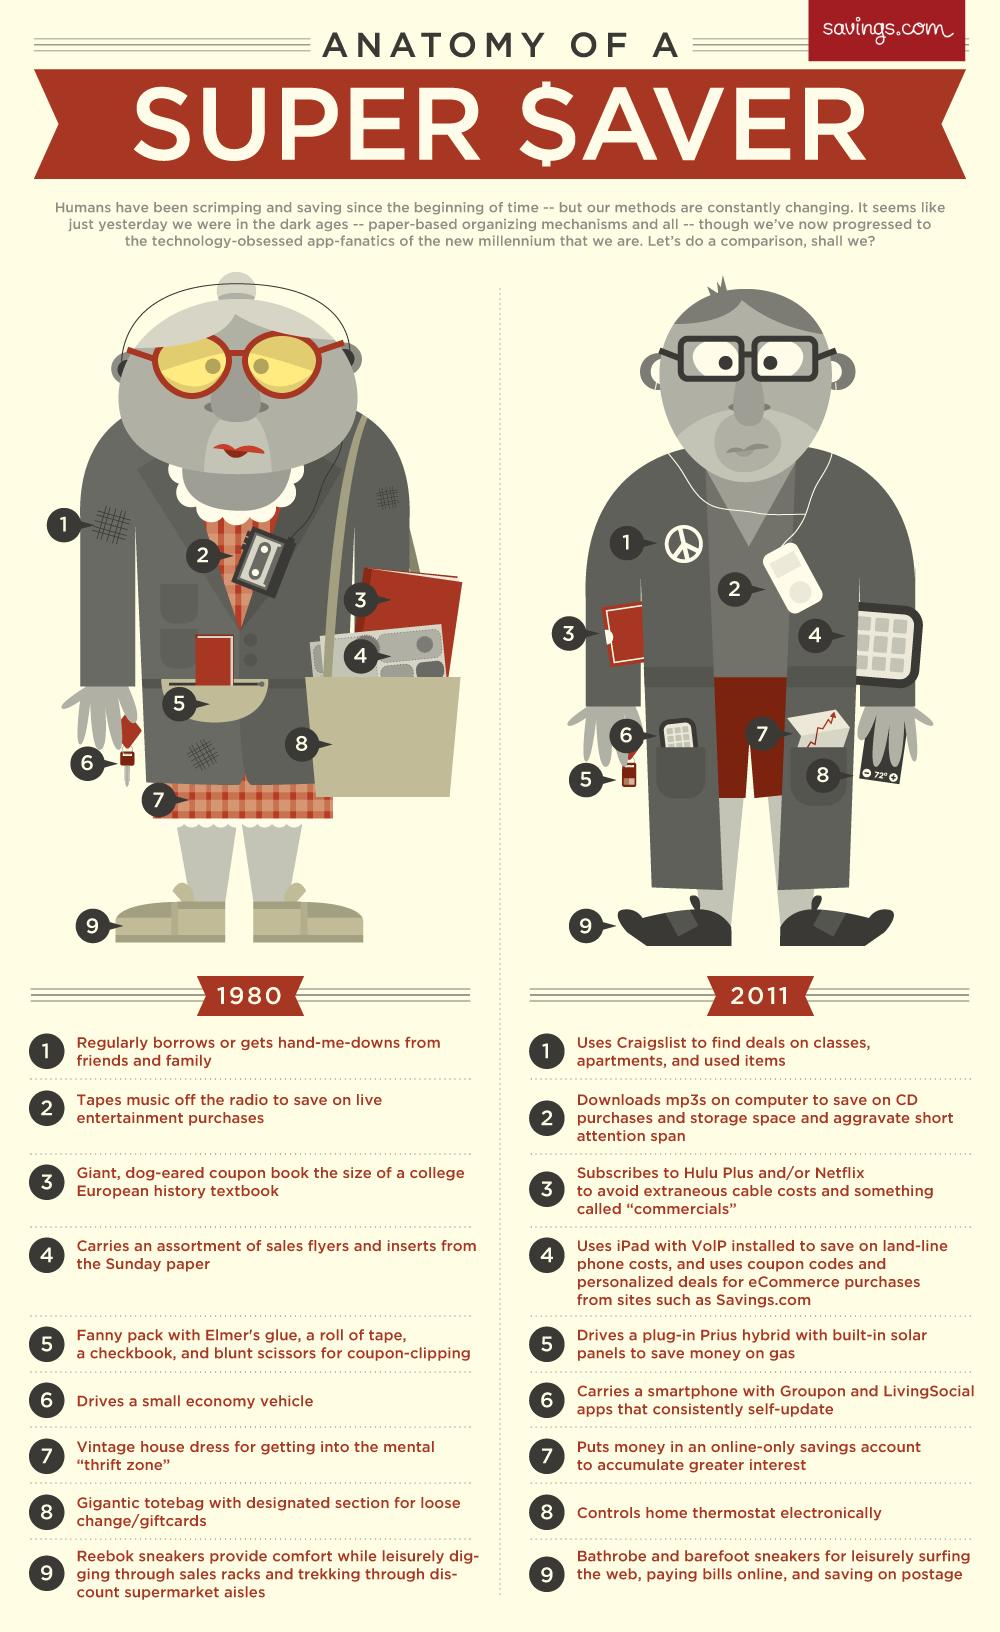 Super Saver 1980 vs. 2011 Infographic